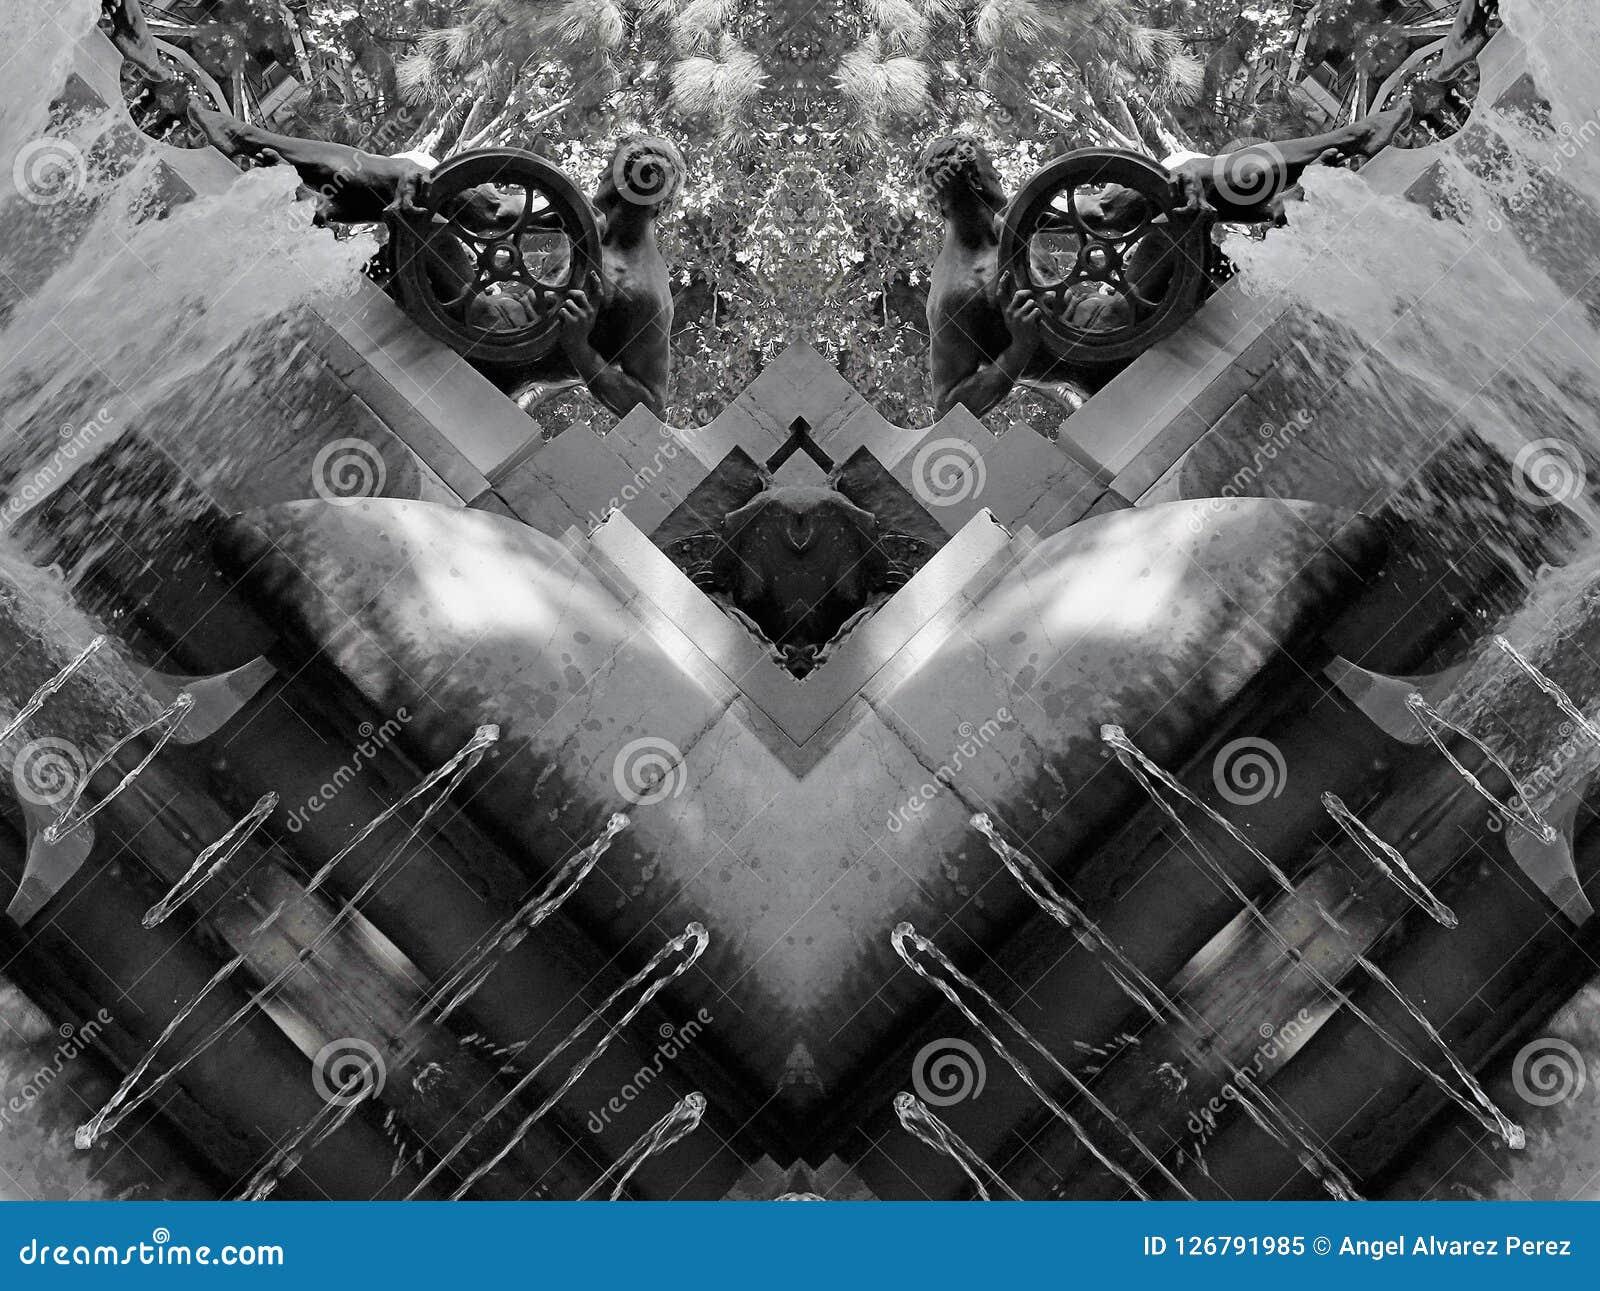 Mirror effect of a fountain